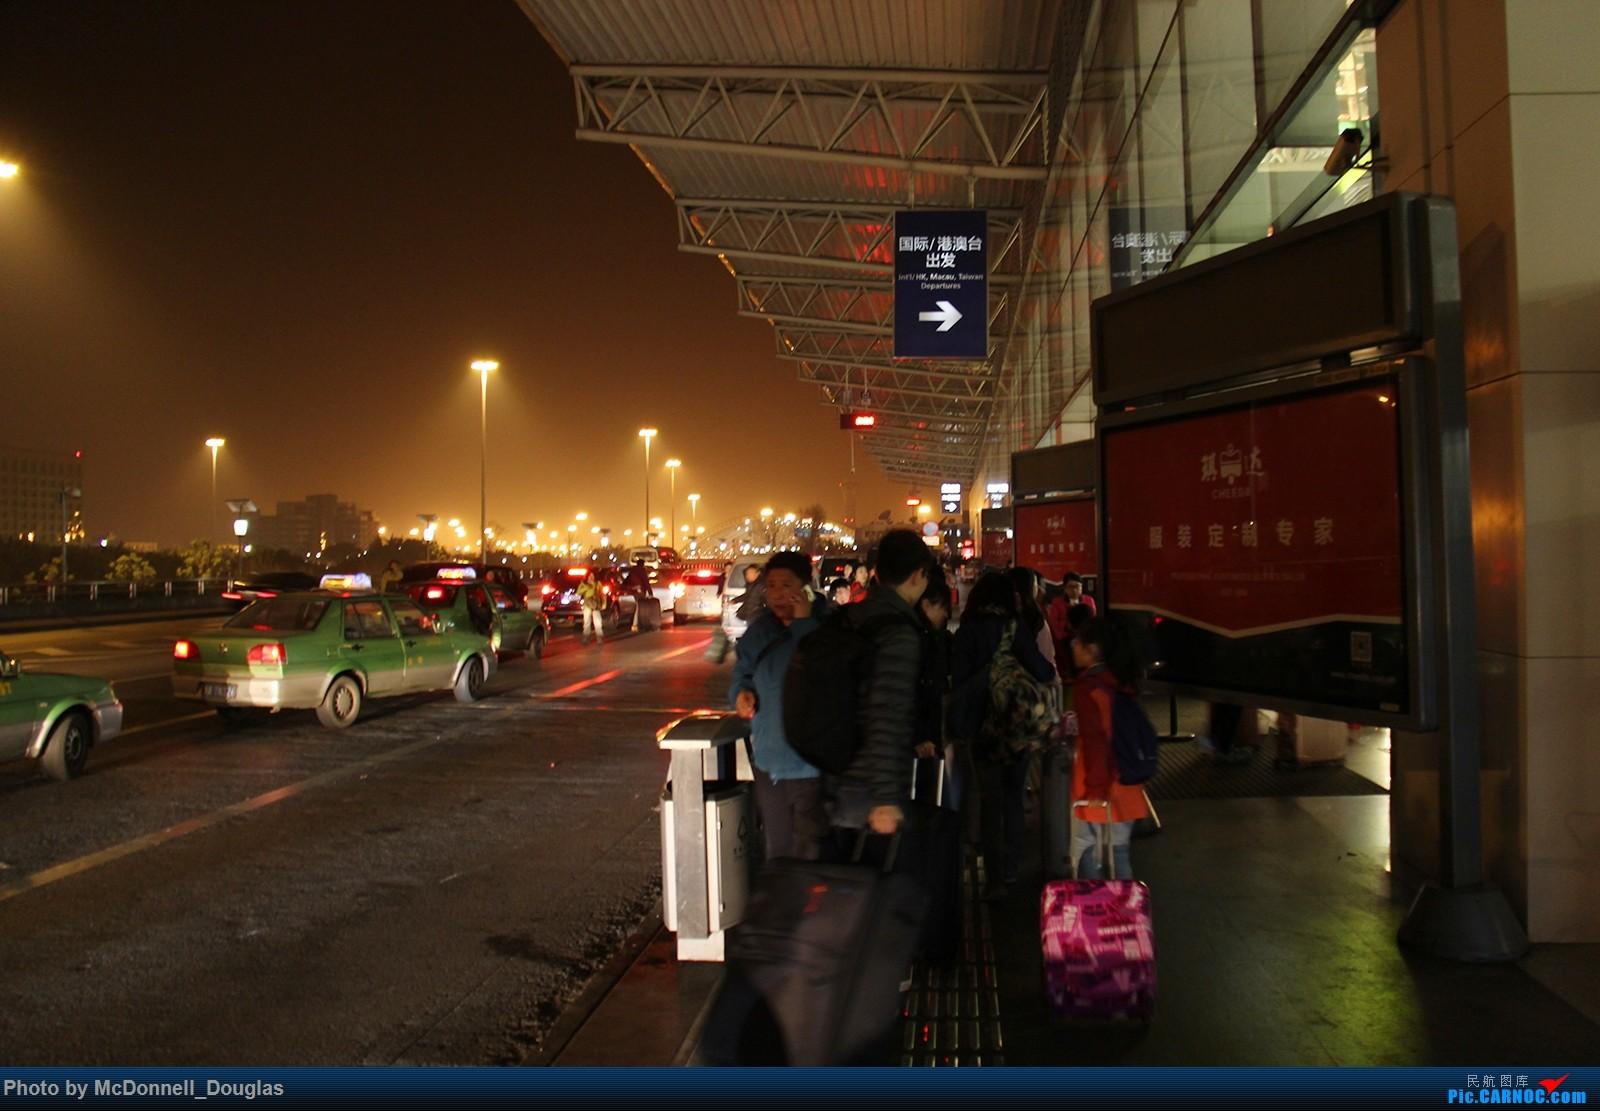 Re:[原创]【上海飞友会】【zc带你游天下(4)】不远千里飞跃喜马拉雅去看你,探寻高山另一边的神秘国度,和一群贫穷却快乐着的人们 AIRBUS A330-243 B-6059  中国成都双流国际机场